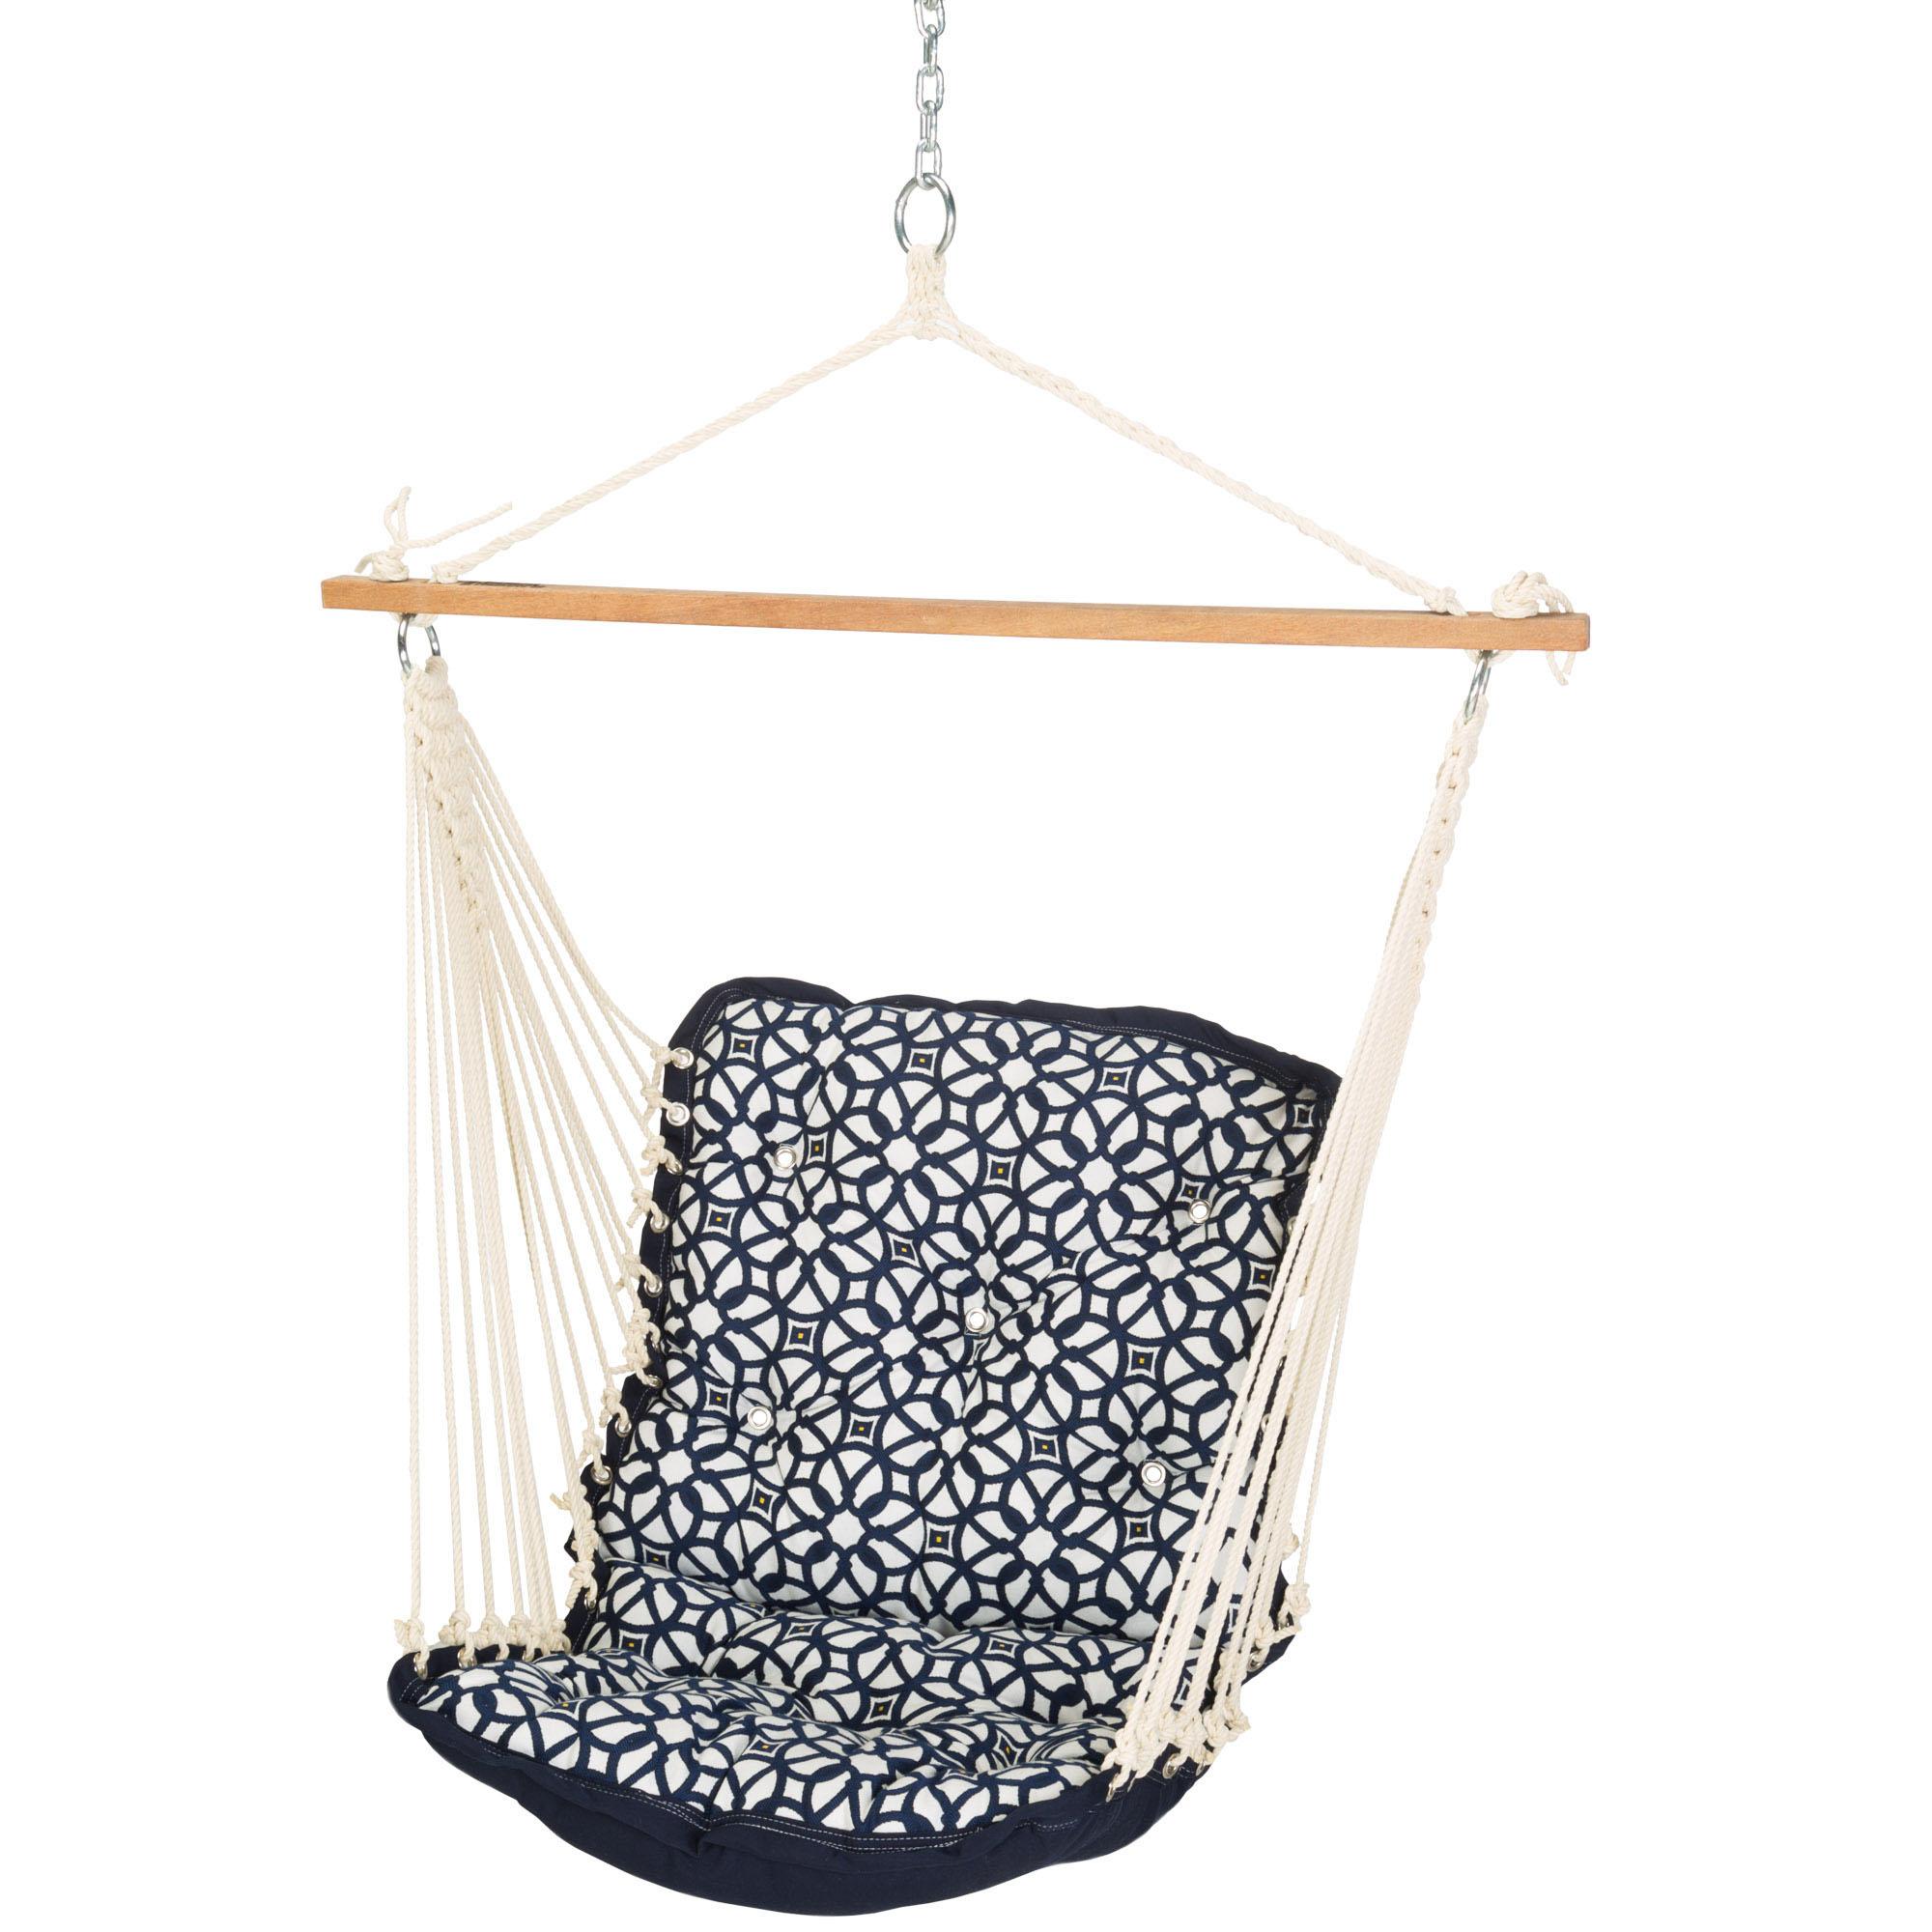 lores hatteras xx pillow hammocks usa island glacier b hammock pawley swings gl s canvas outdoor